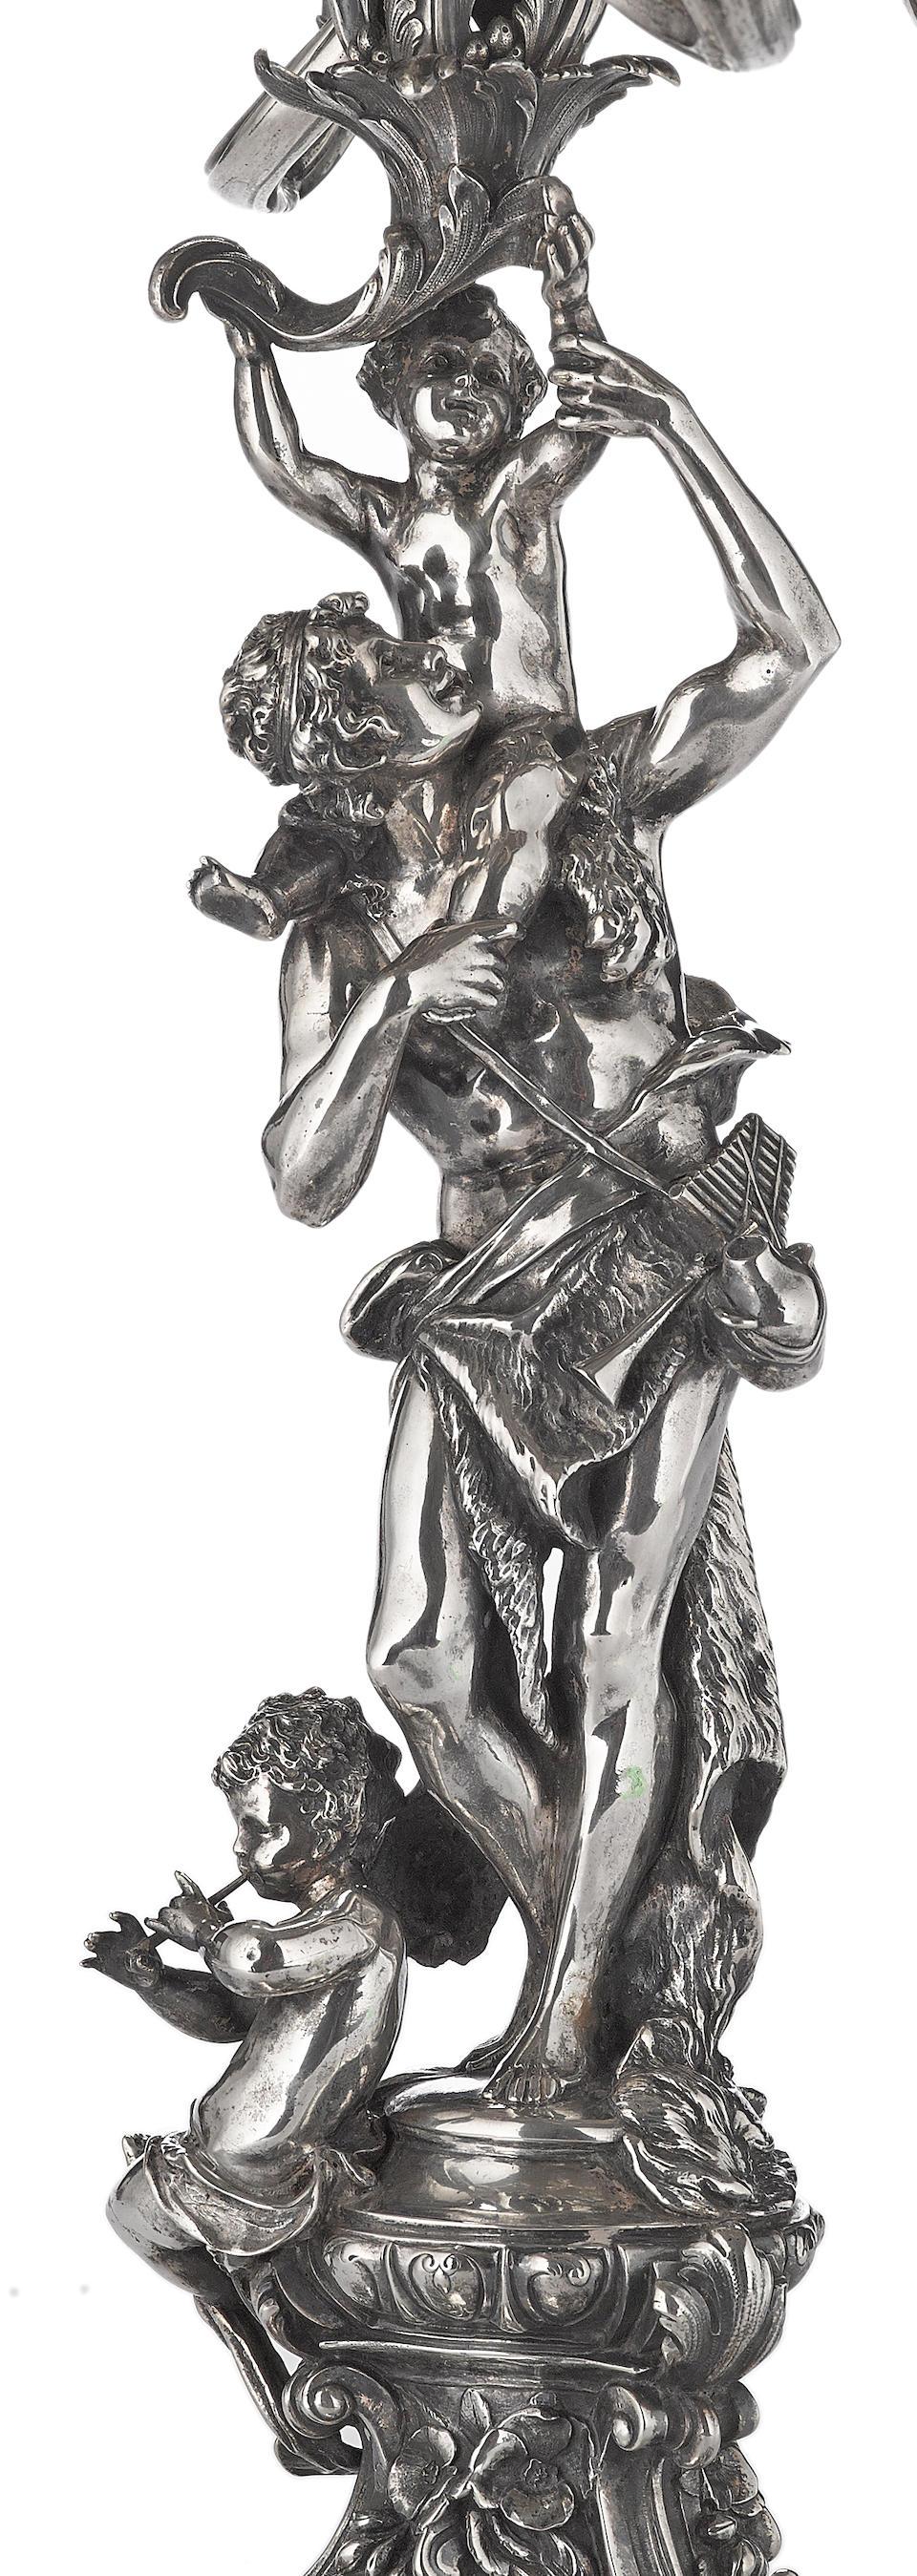 A monumental pair of German  800 standard silver Rococo style figural nine-light candelabra by Körner and Proll; retailed by Gebrüder Friedlander, Berlin,  late 19th century